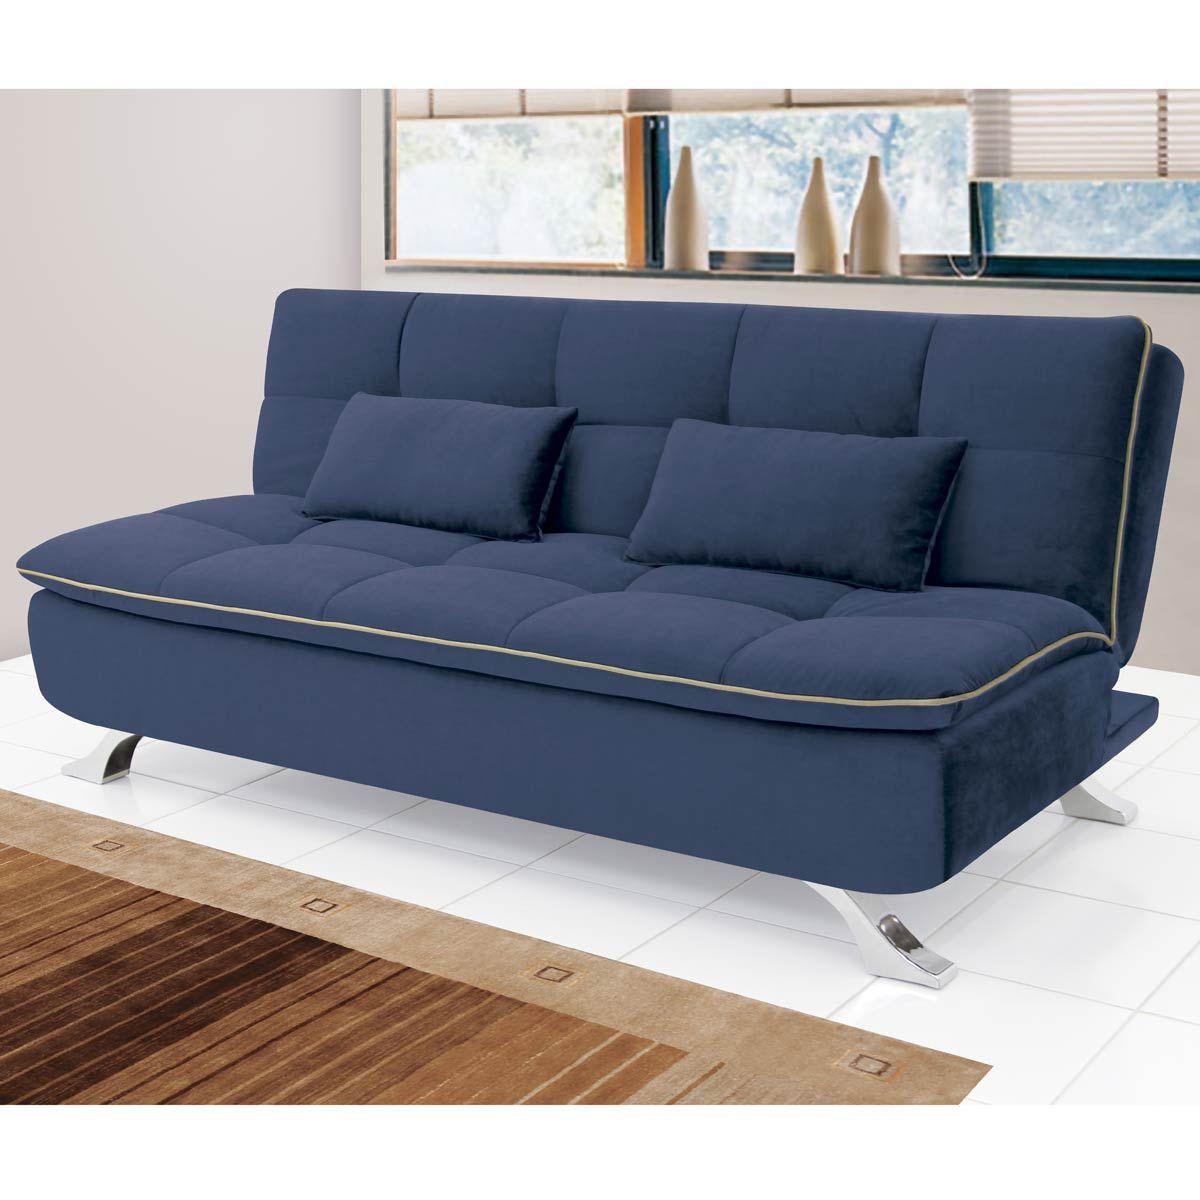 Gostou desta Sofá Cama Mayara 3 Lugares 1,90 M Suede Azul ... on sofa designs, sofa blanco, sofa wood, sofa covers, sofa couches, sofa beds, sofa chair, sofa de dois foto, sofa in-house, sofa styles, sofa legs, sofa car, sofa mart, sofa love, sofa china, sofa azul,